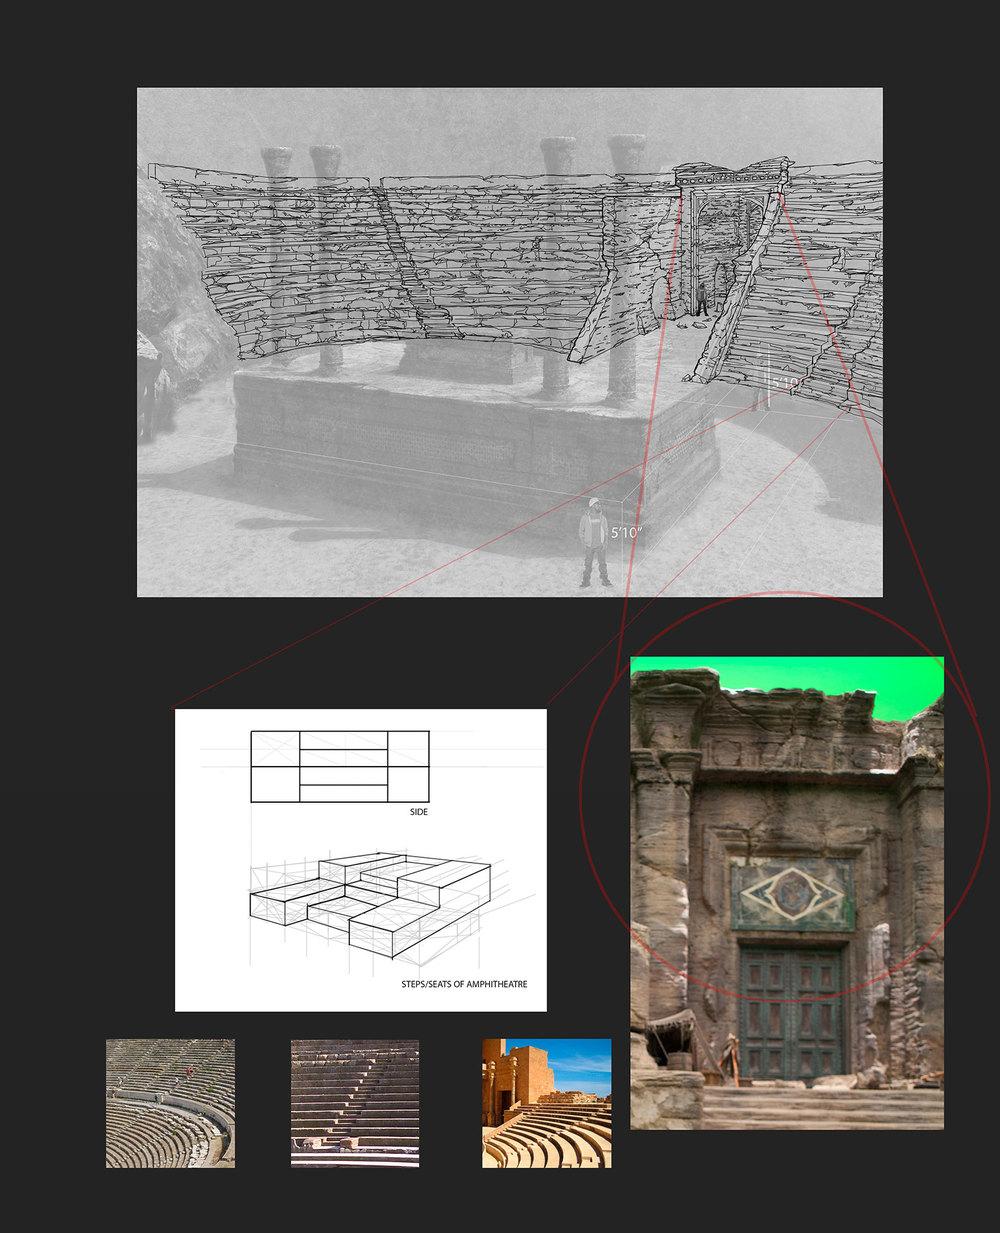 amphitheatre_v2.jpg